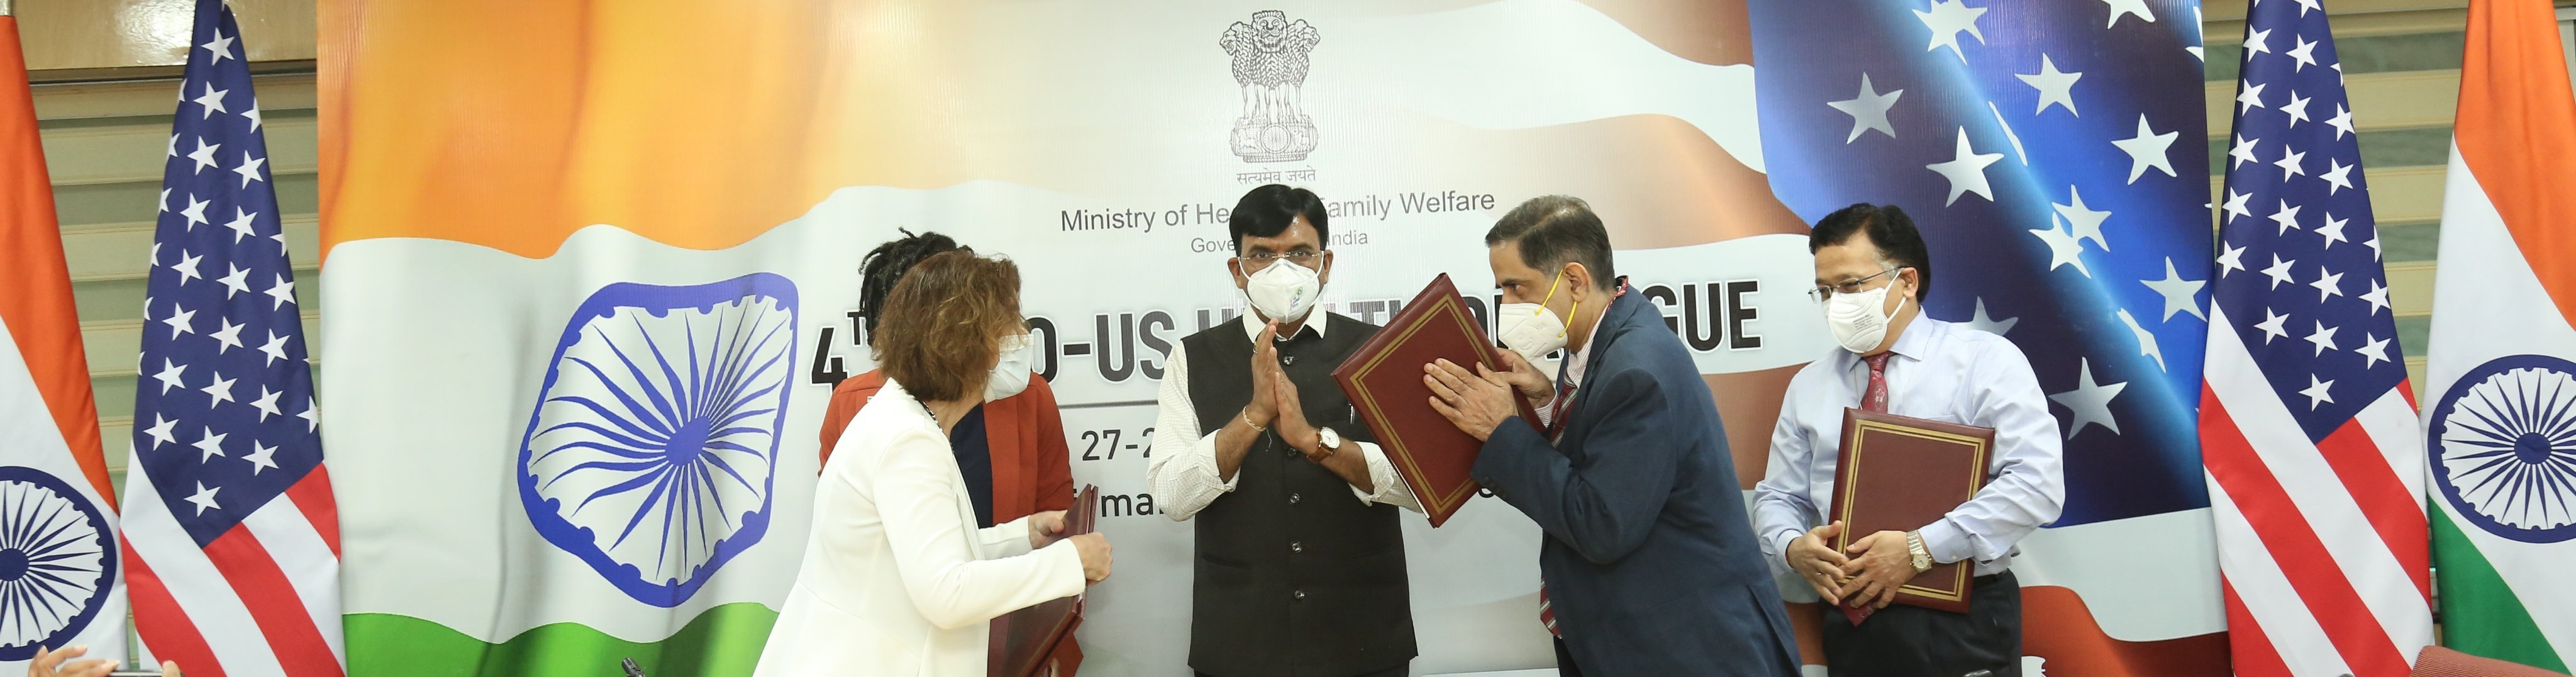 4th INDO-US Health Dialogue